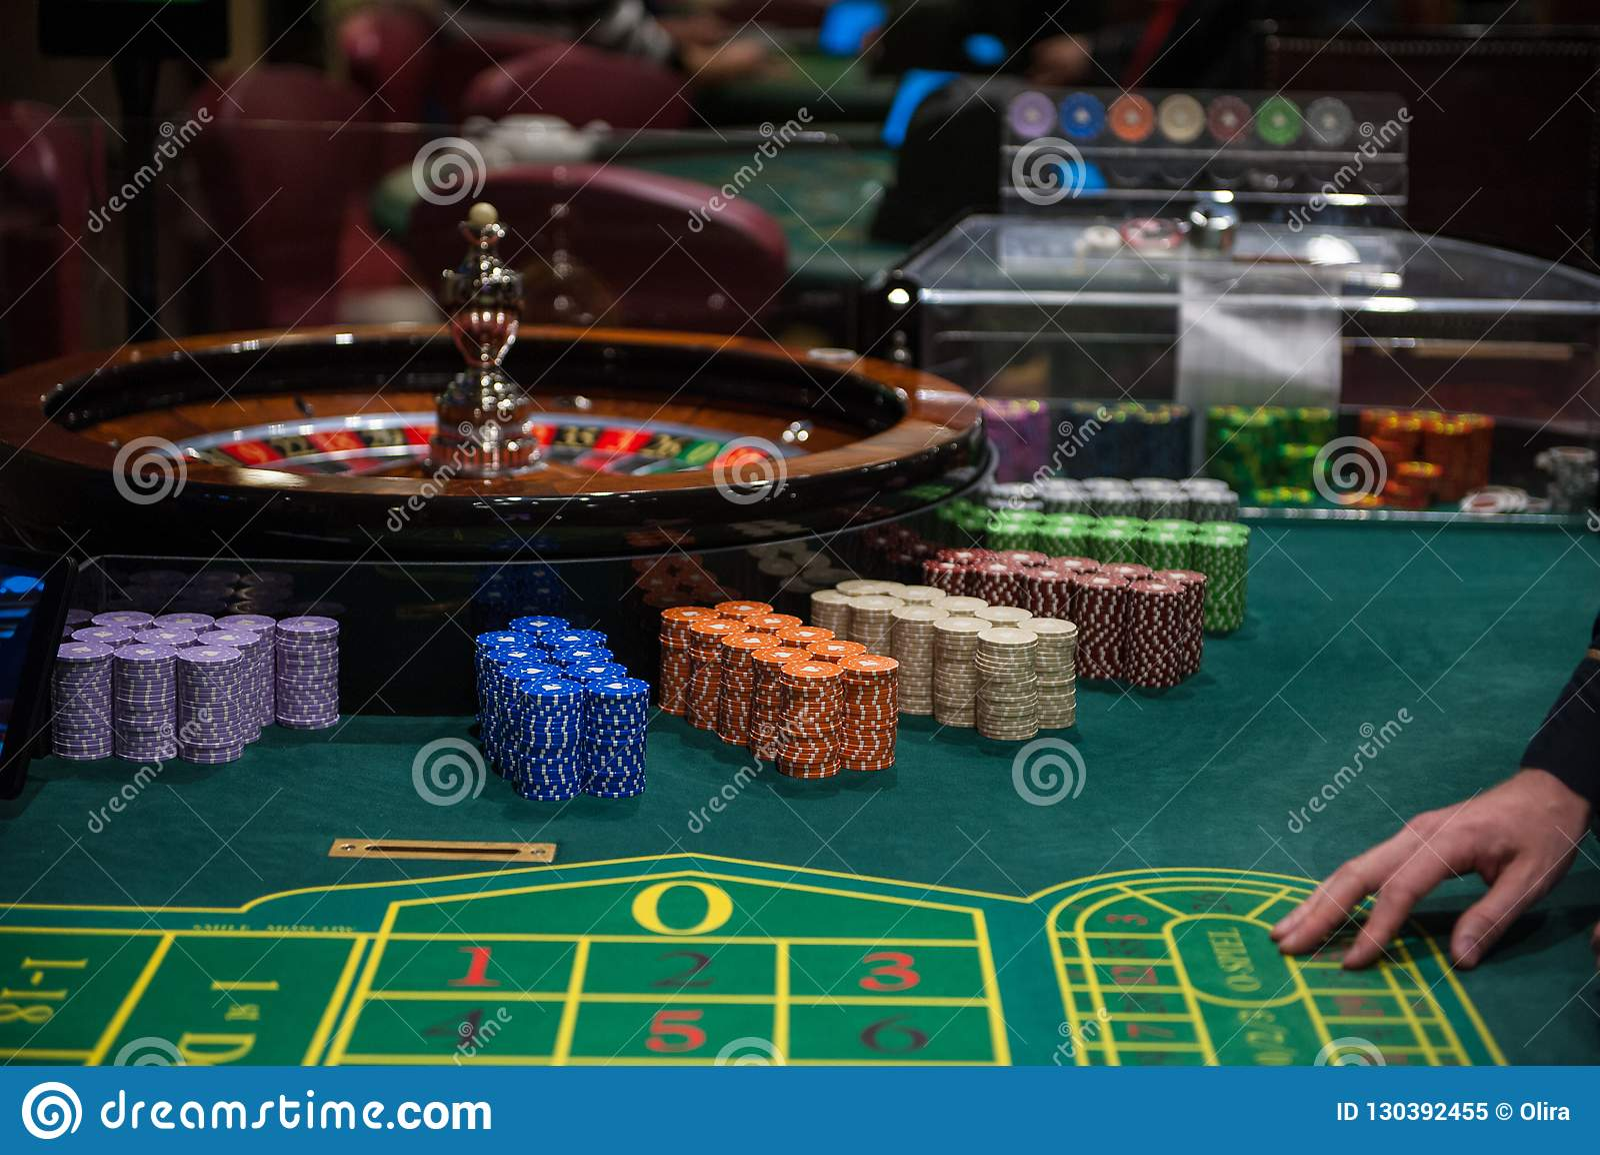 Casino lifestyle hotel